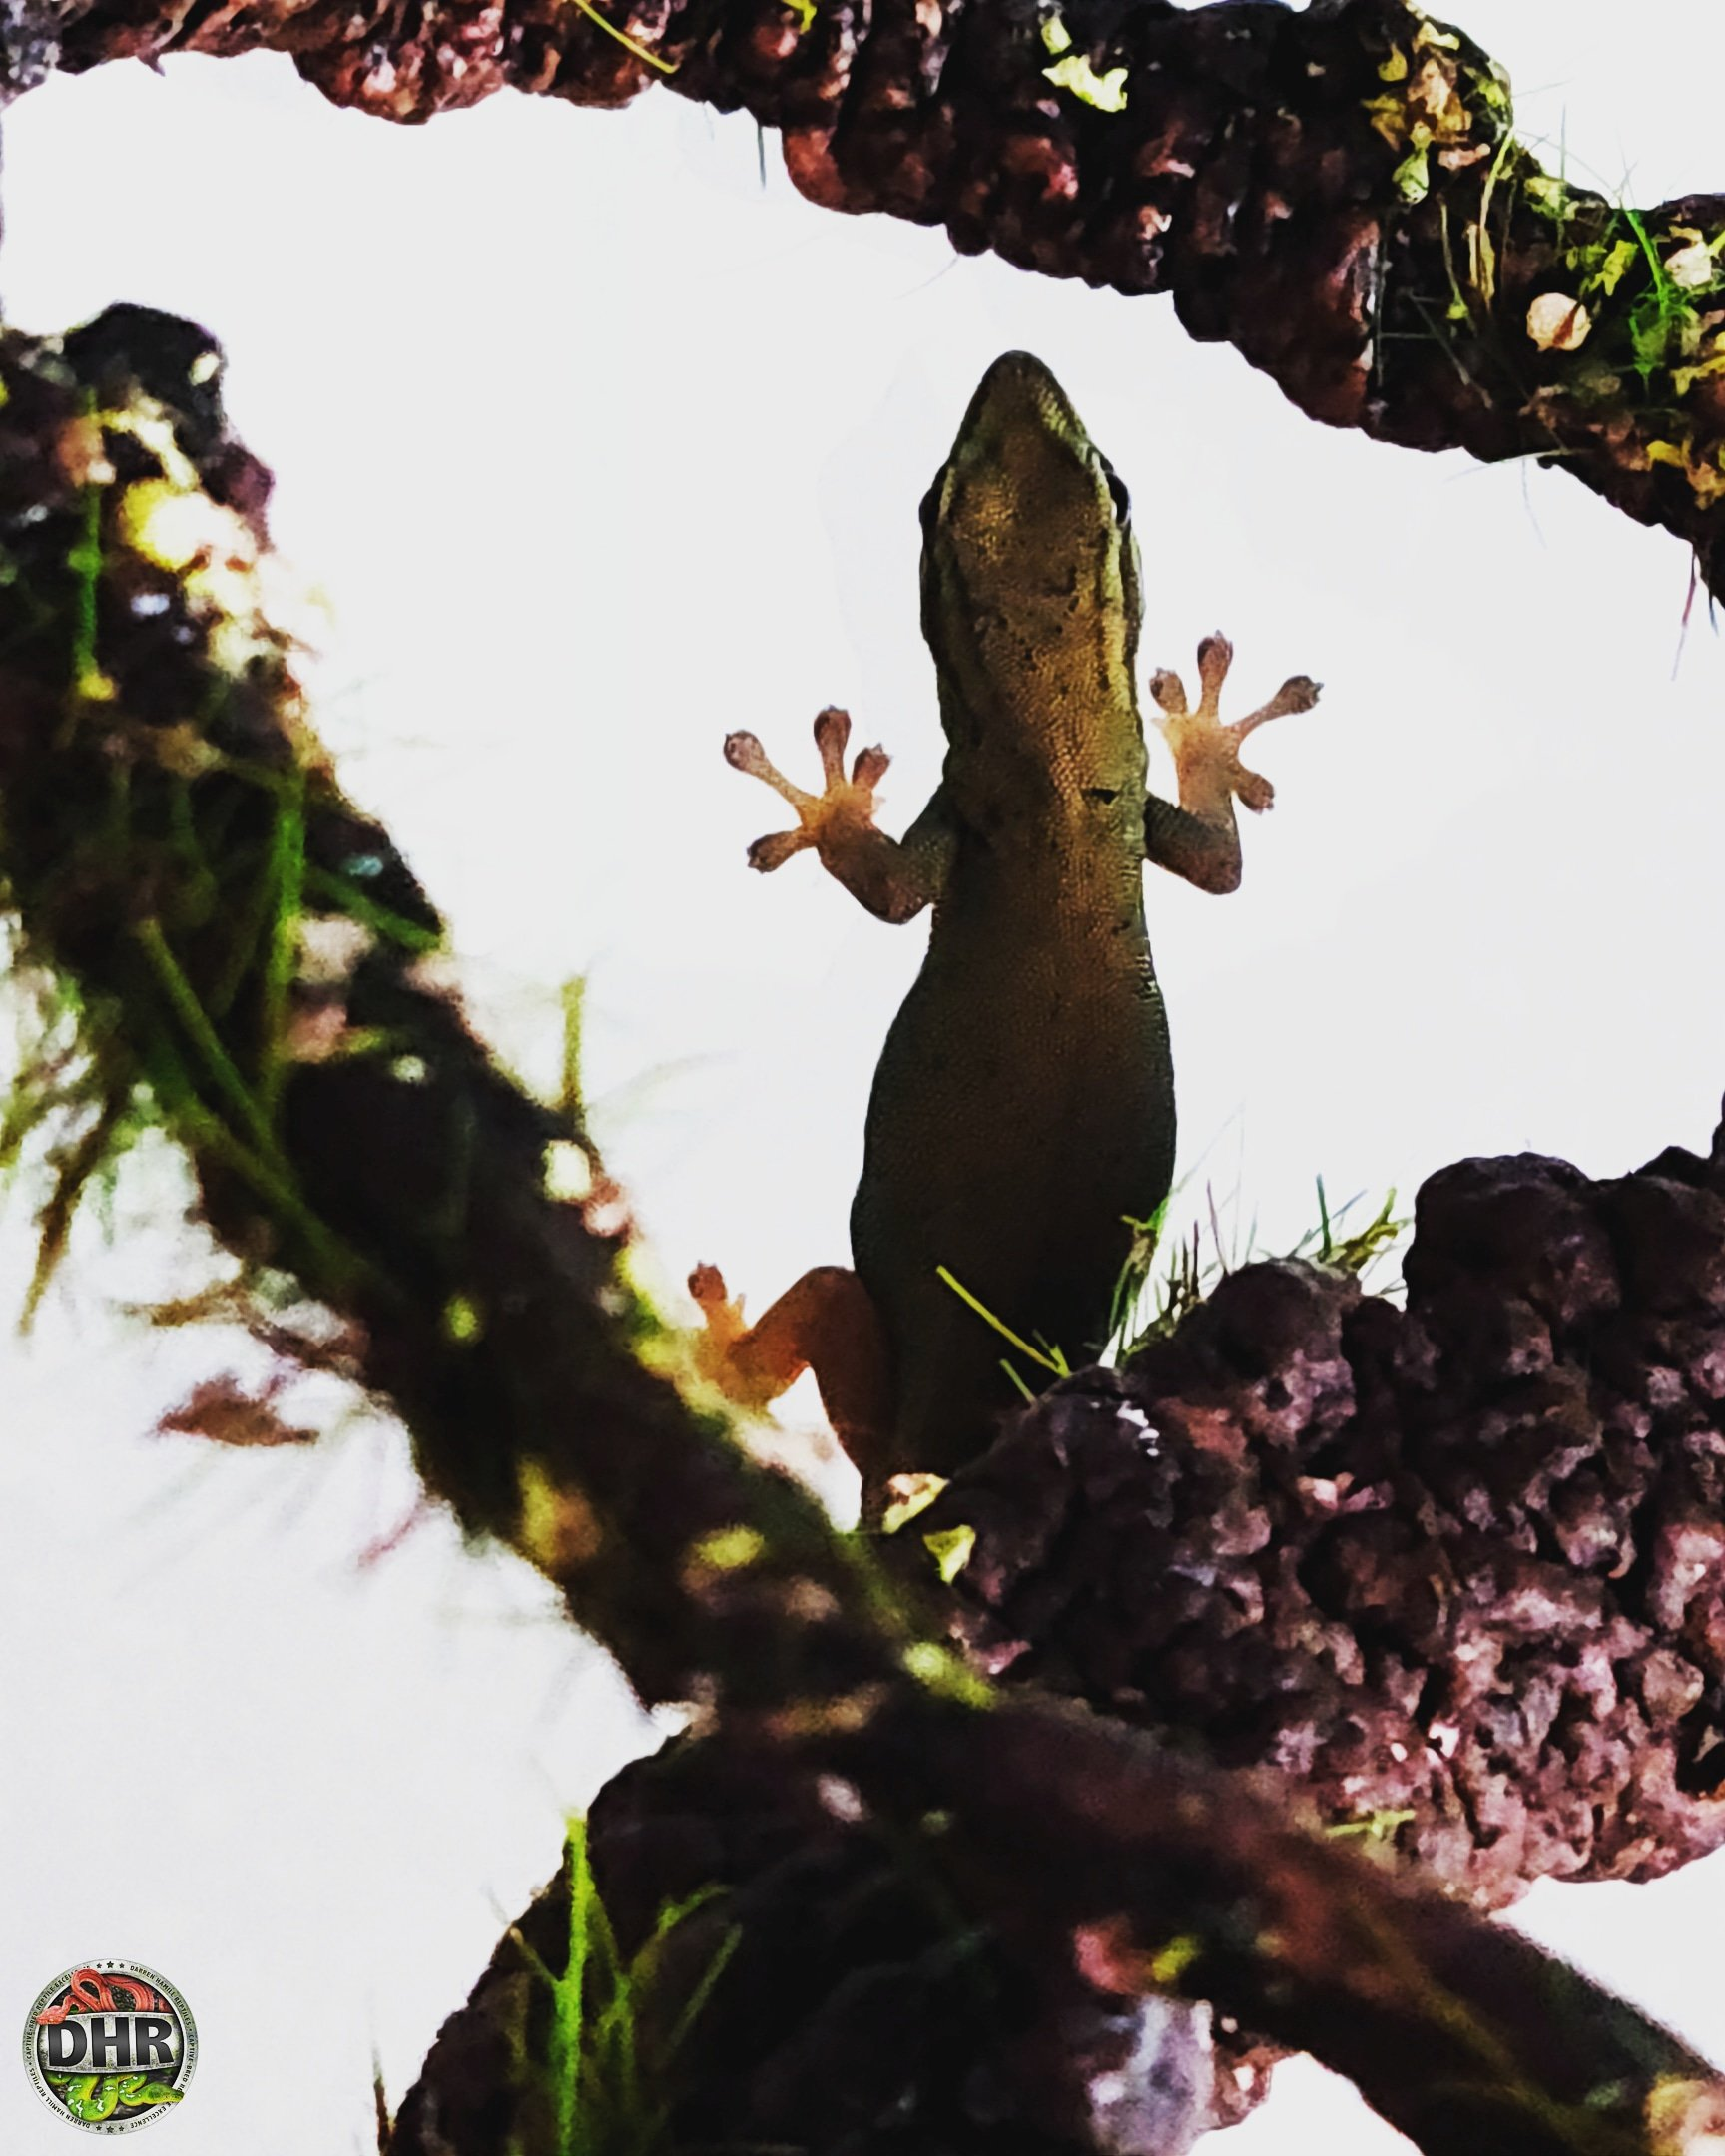 A young female Electric Blue Gecko (Lygodactyluswilliamsi)